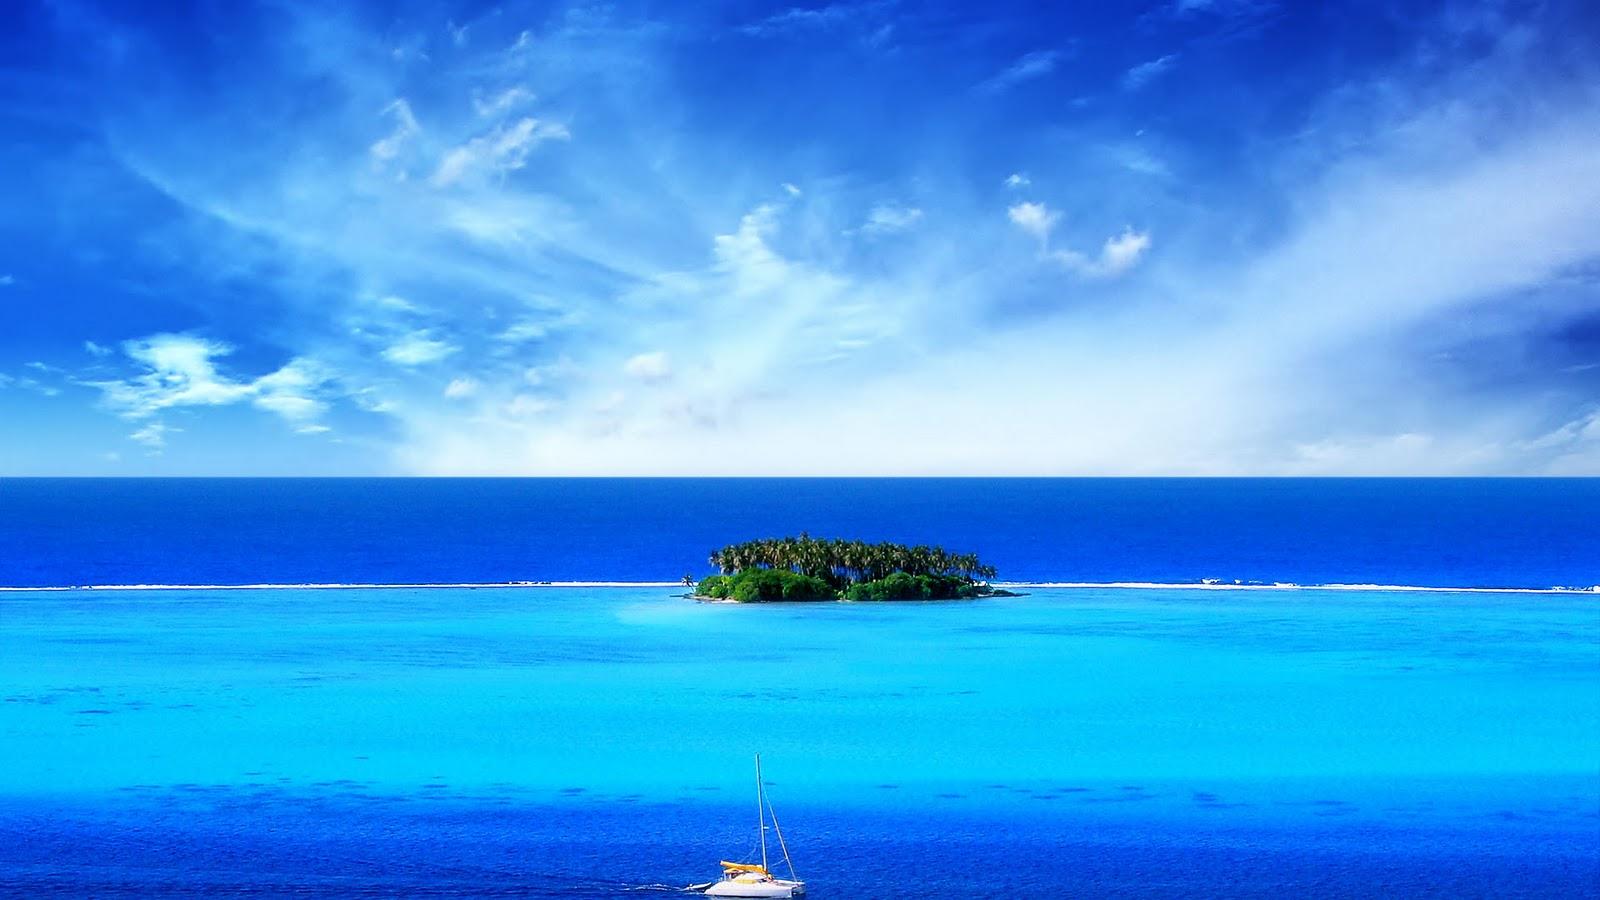 http://1.bp.blogspot.com/-NNcHClB0joI/Ty6nJowRPiI/AAAAAAAAAvU/nvy04btMqZ0/s1600/The-Island-Wallpaper-1600x900-HD+.jpg